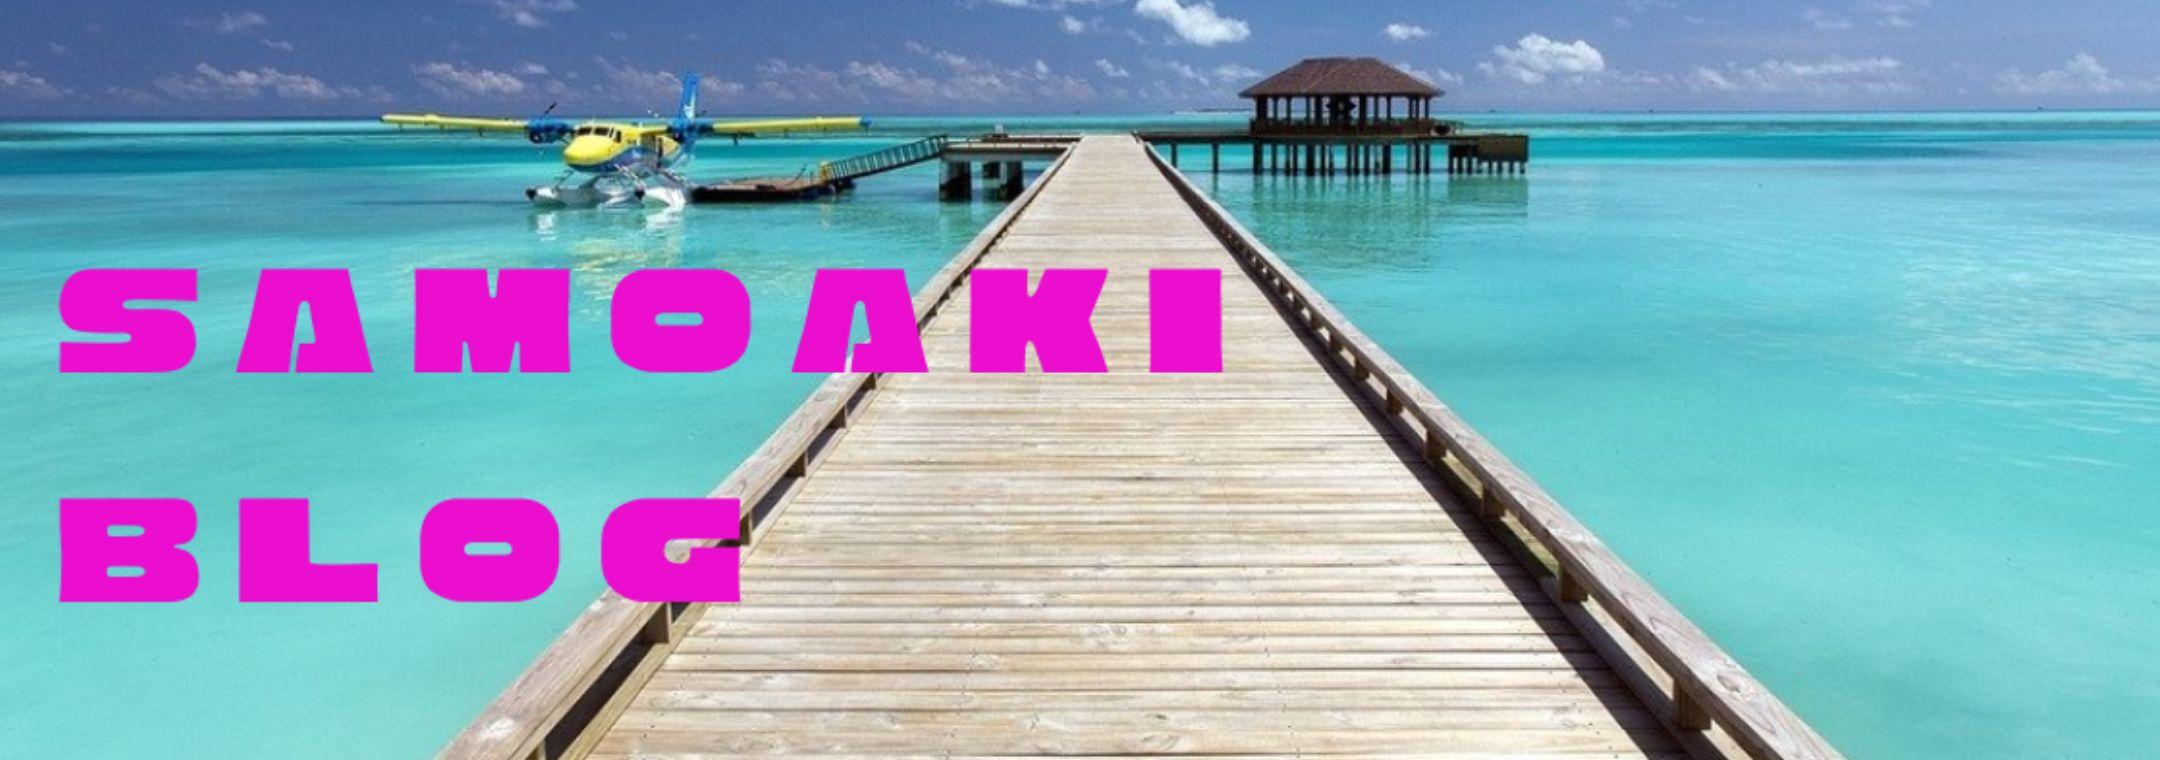 Samoaki Blog